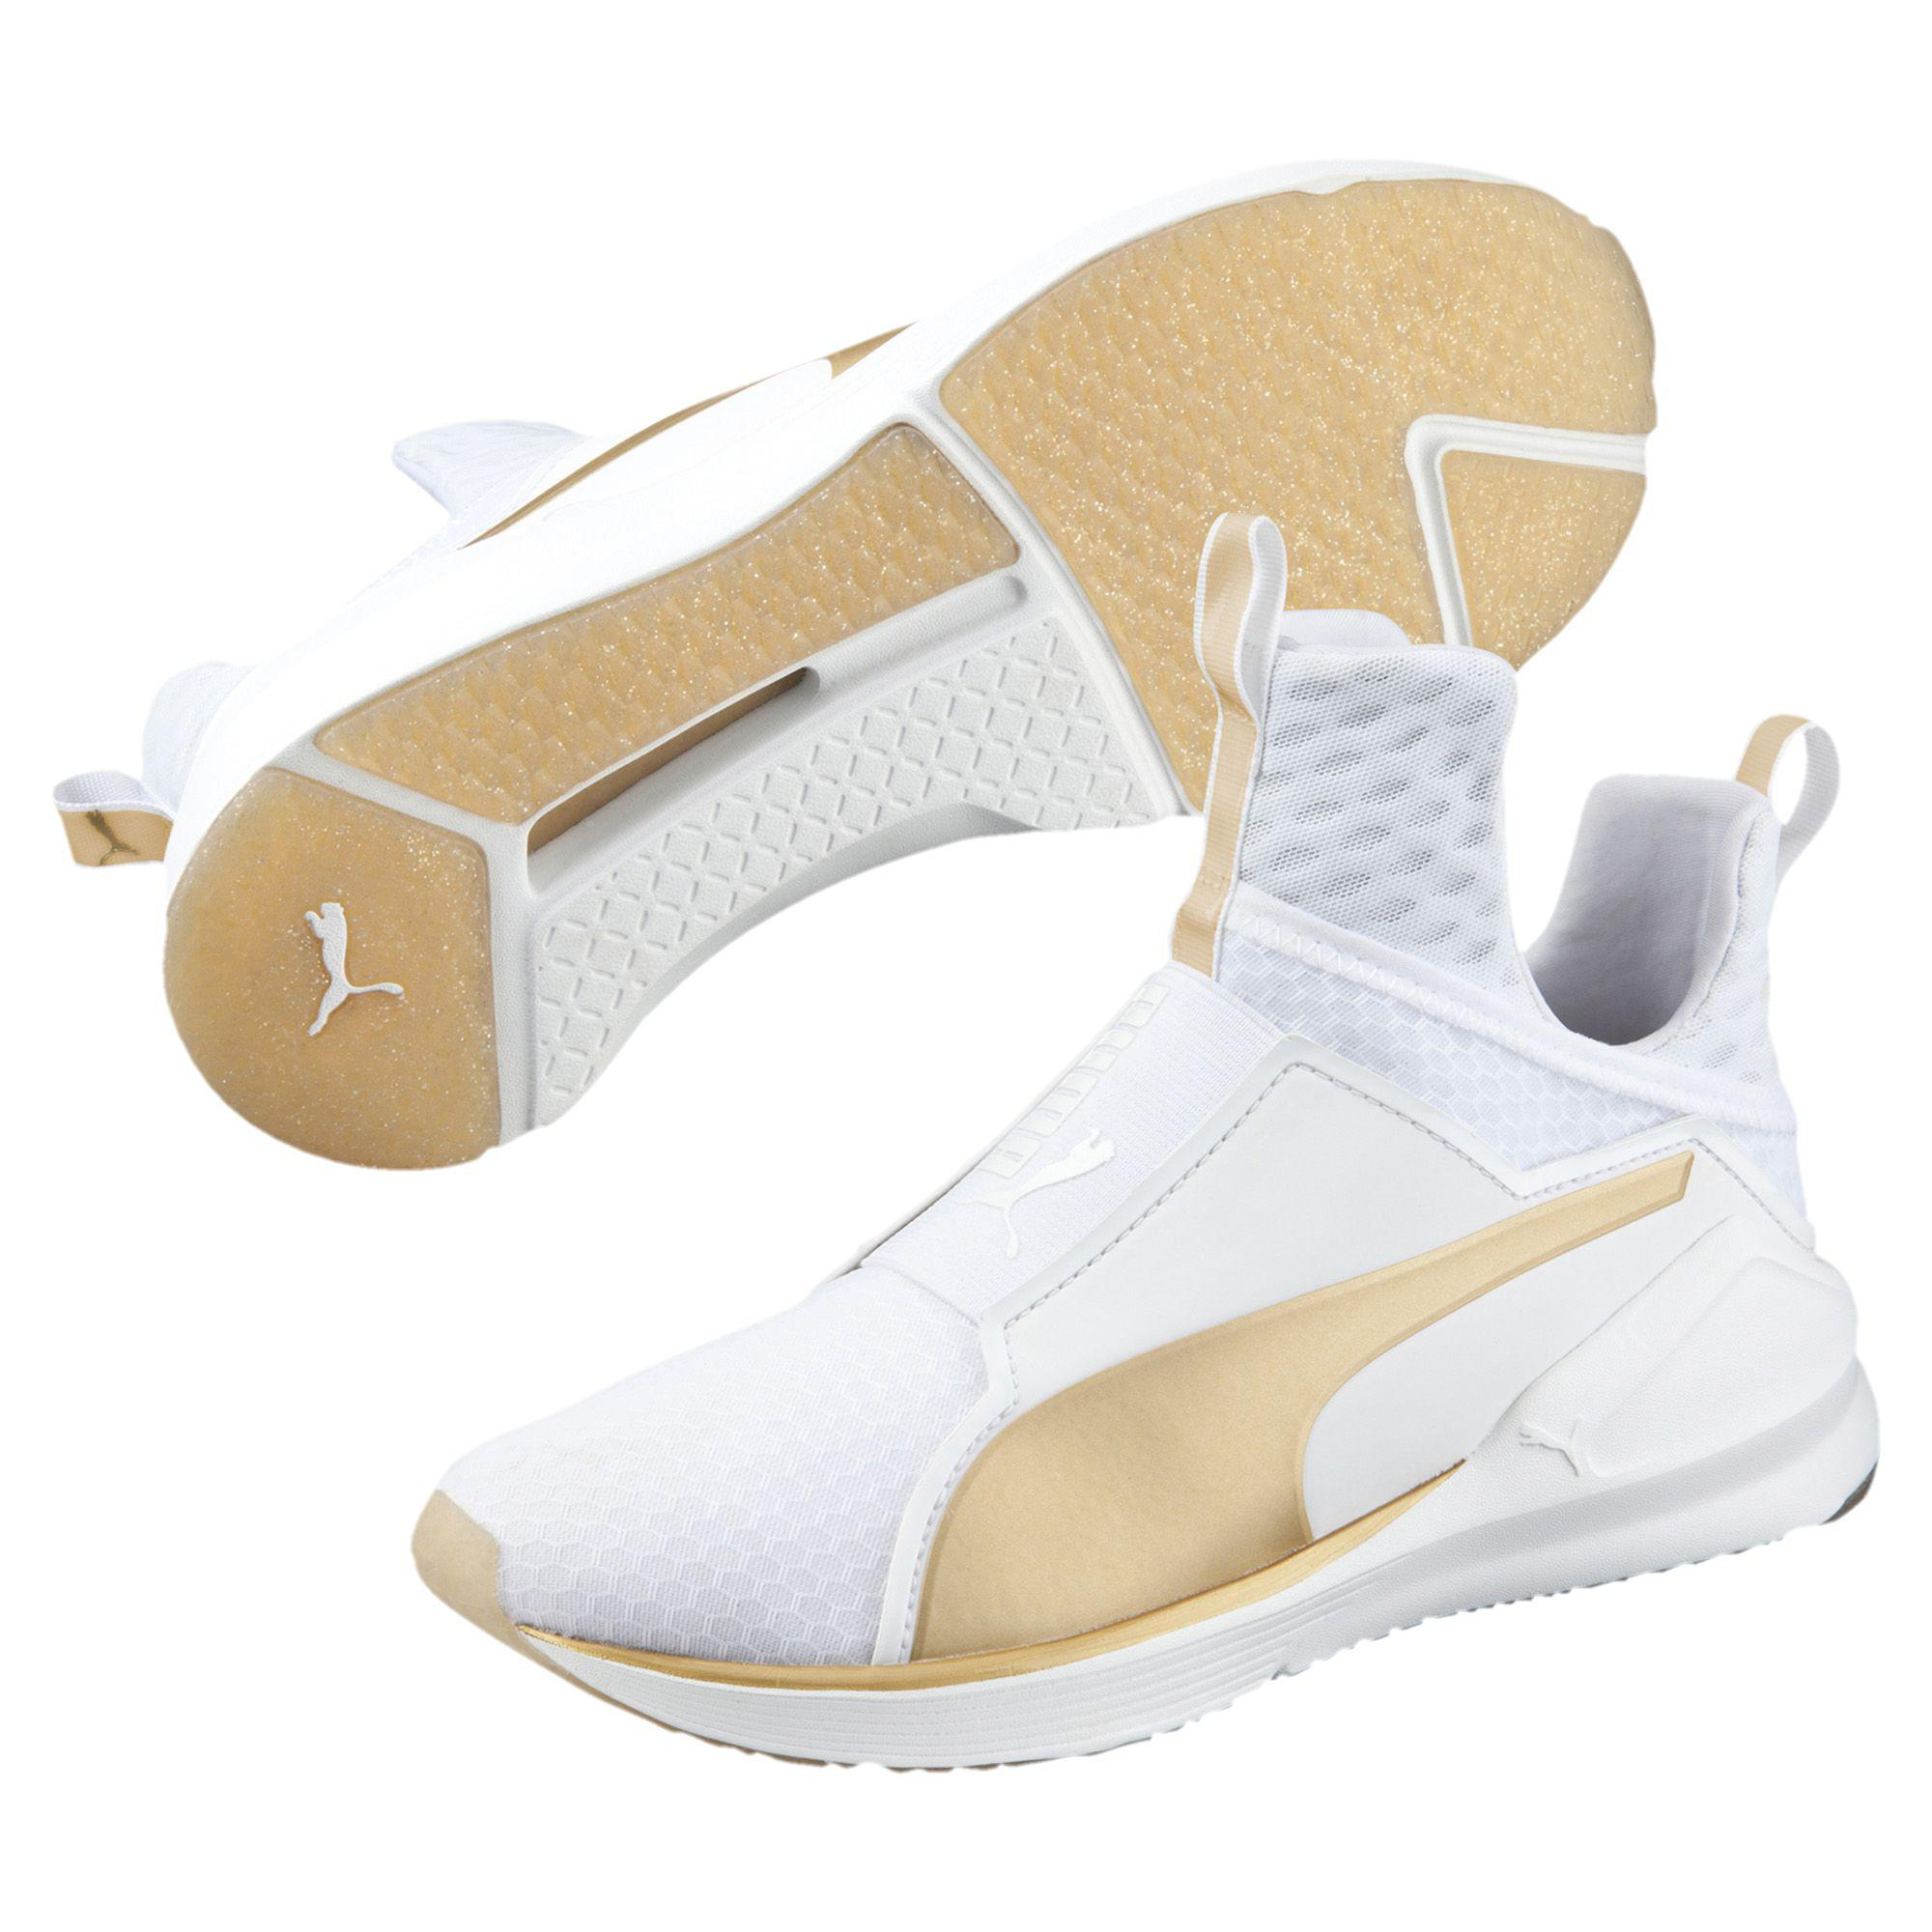 253fde1b697b Lyst - PUMA Fierce Gold Women s Training Shoes